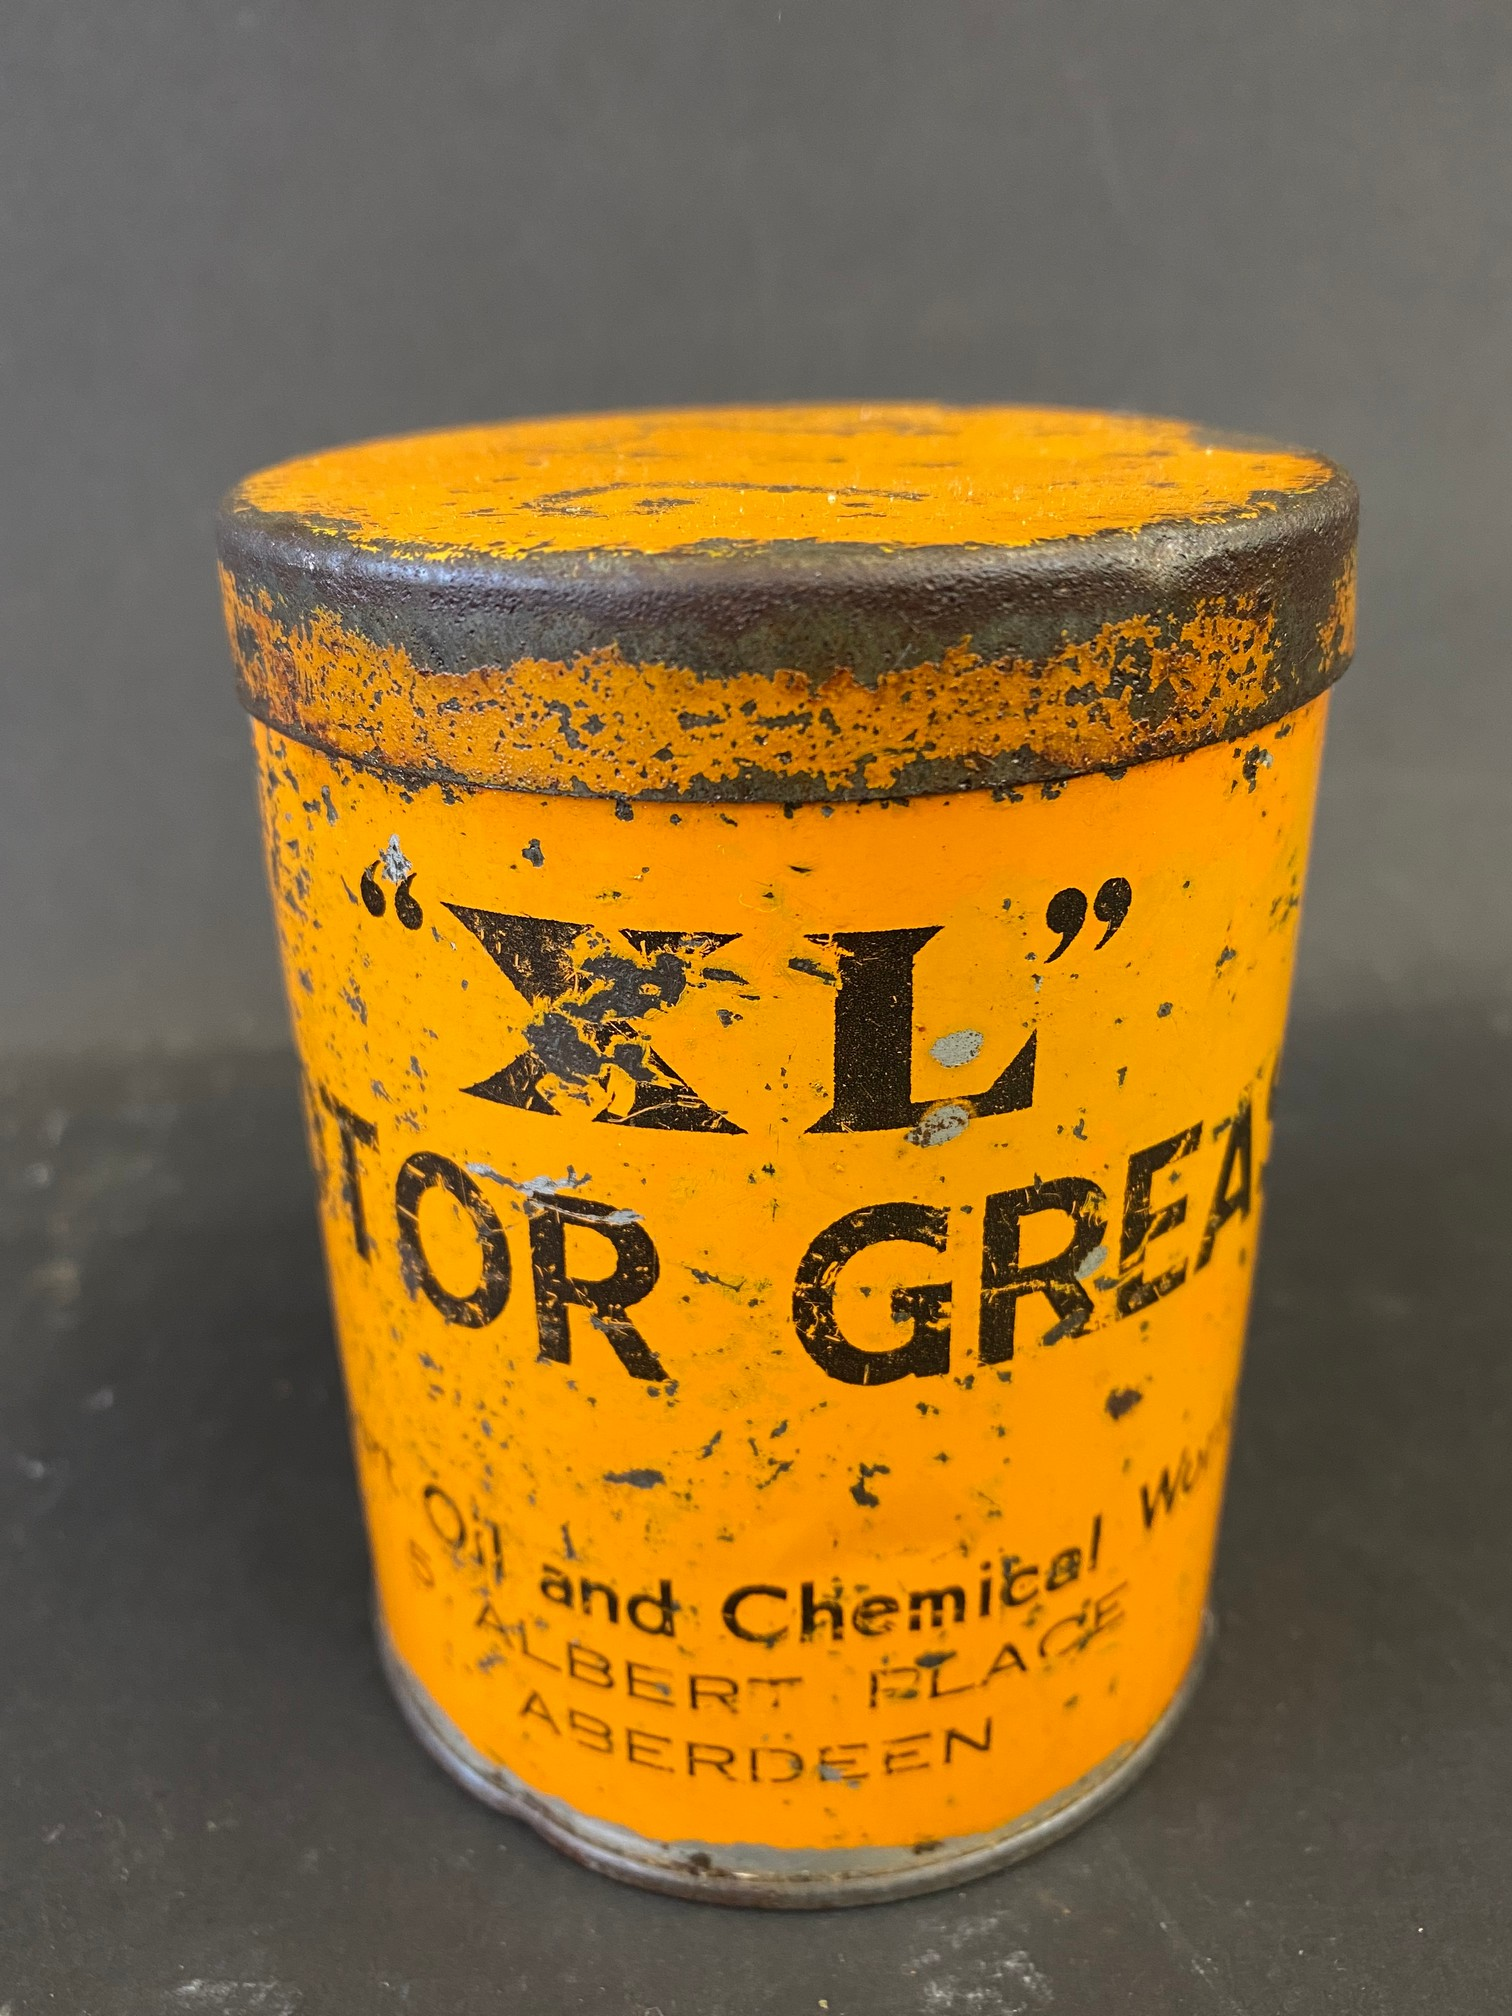 An XL Motor Grease tin.